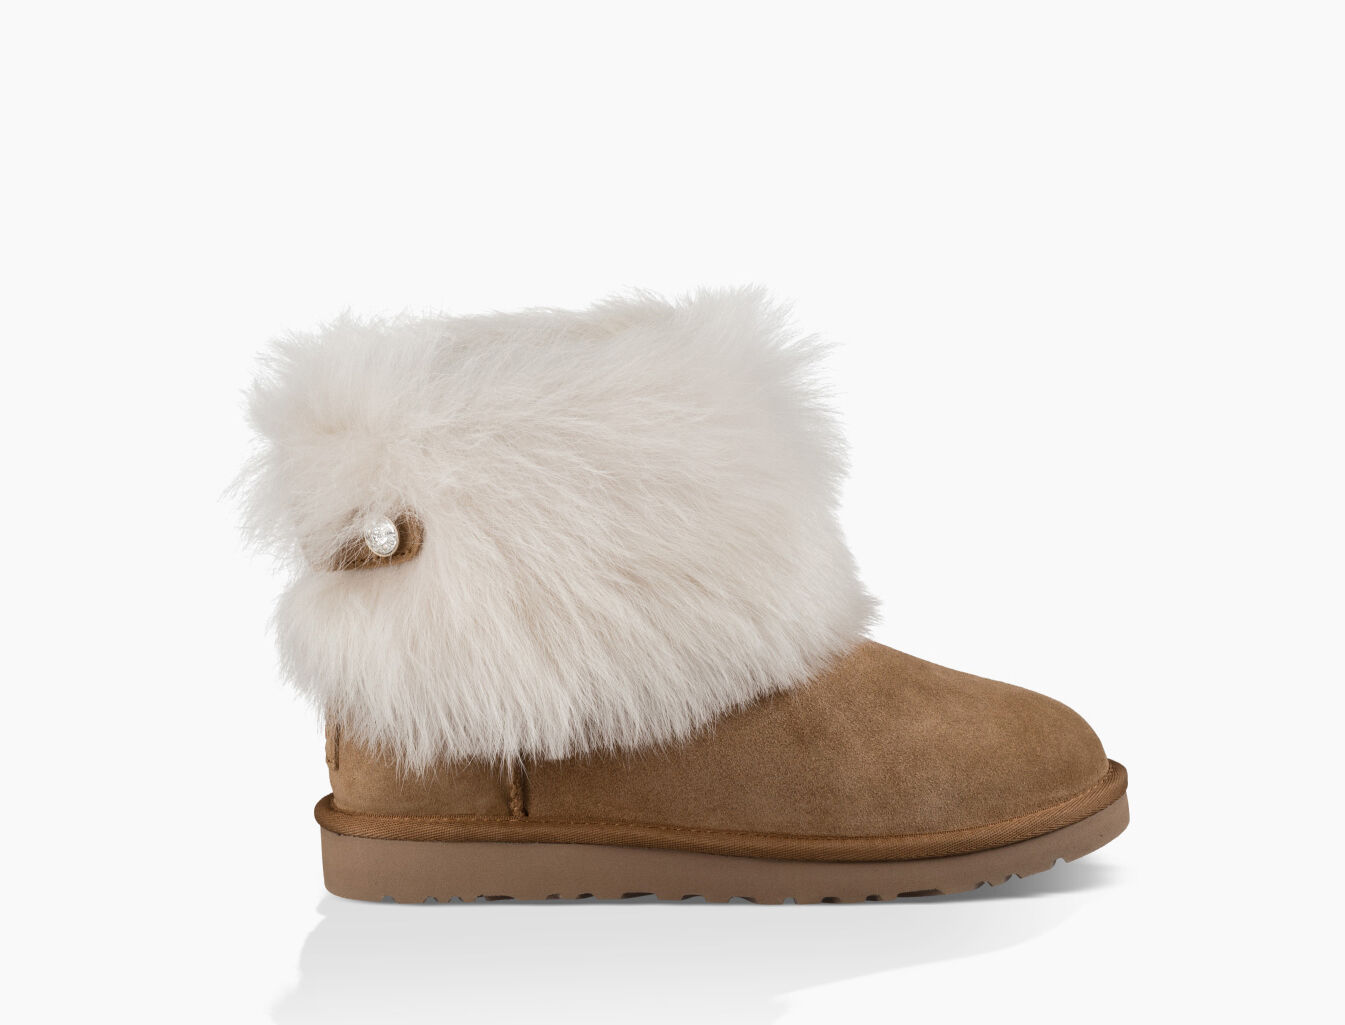 ugg official women s valentina sheepskin cuff boots ugg com rh ugg com